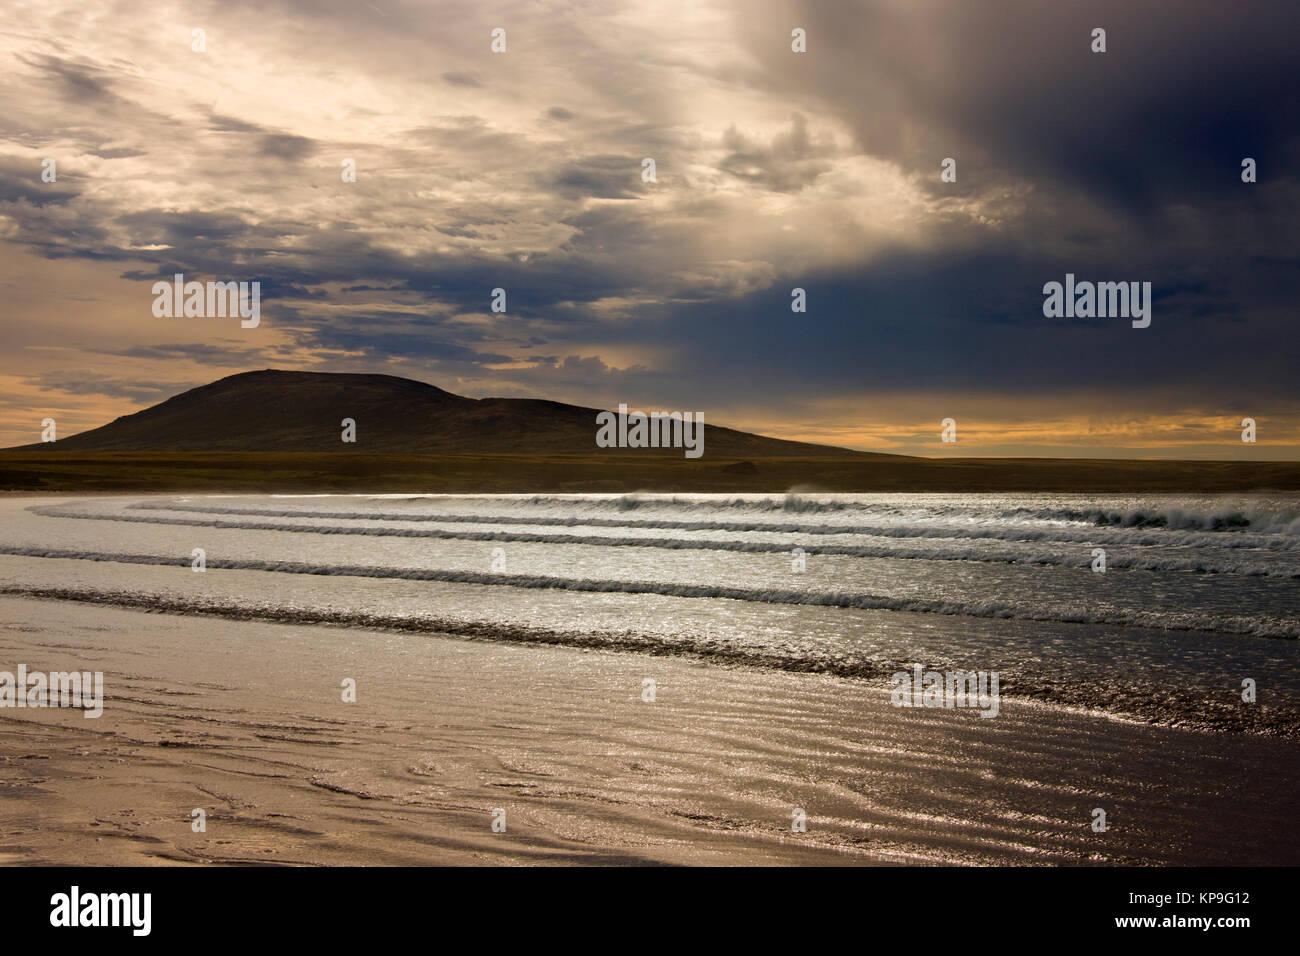 Dusk at Elephant Bay on Pebble Island in the Falkland Islands - Stock Image